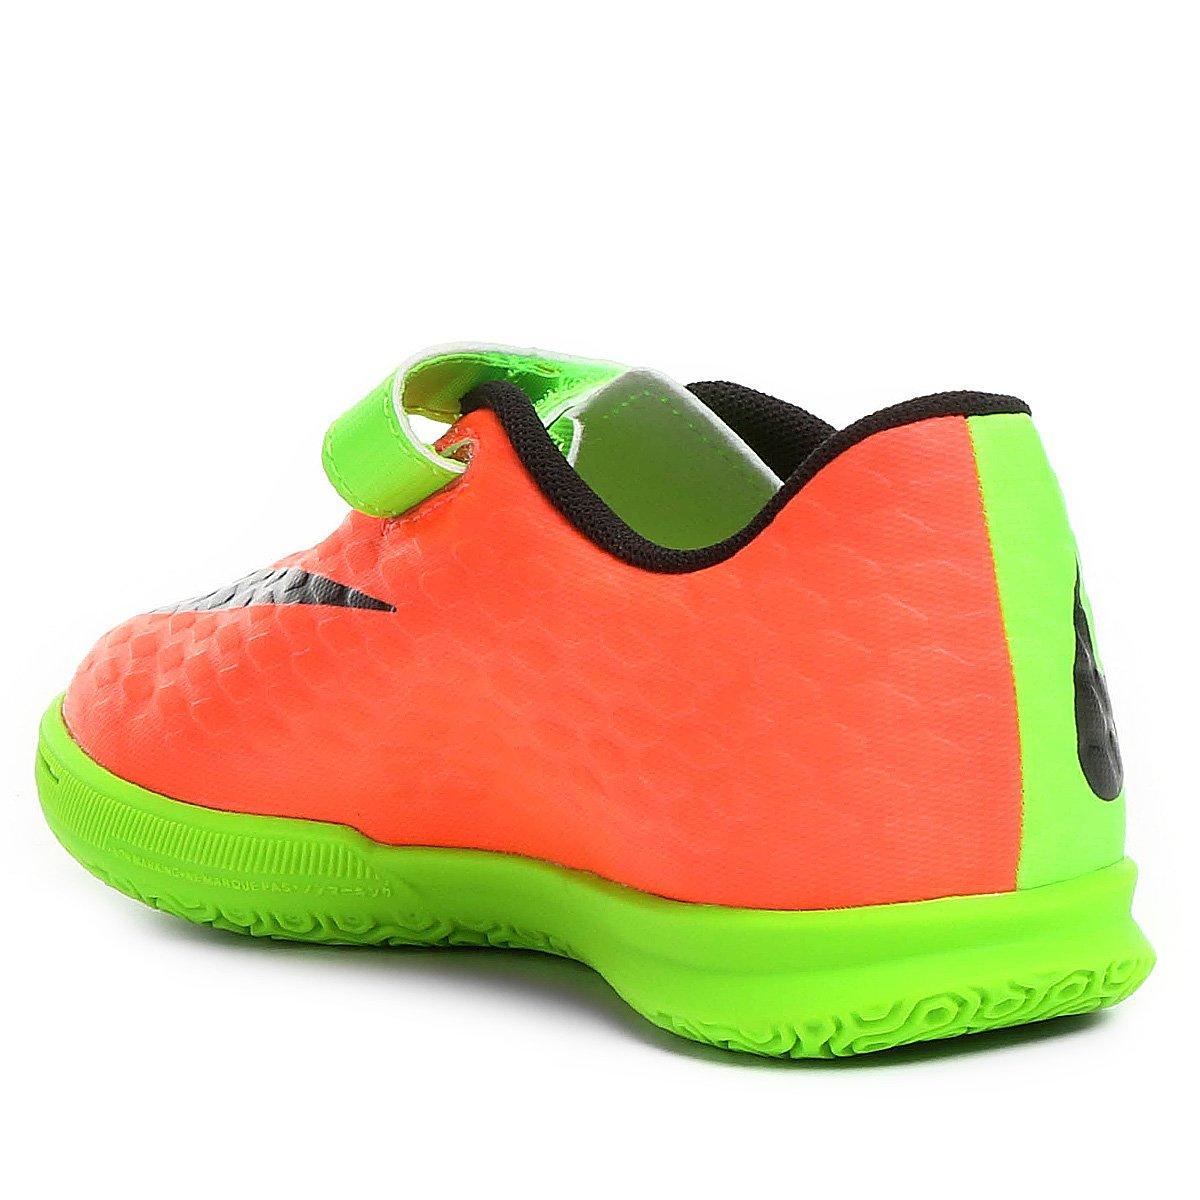 ... where to buy chuteira futsal infantil nike hypervenom phade 3 v ic  8a6db 4cd78 7d65ad03d6a89